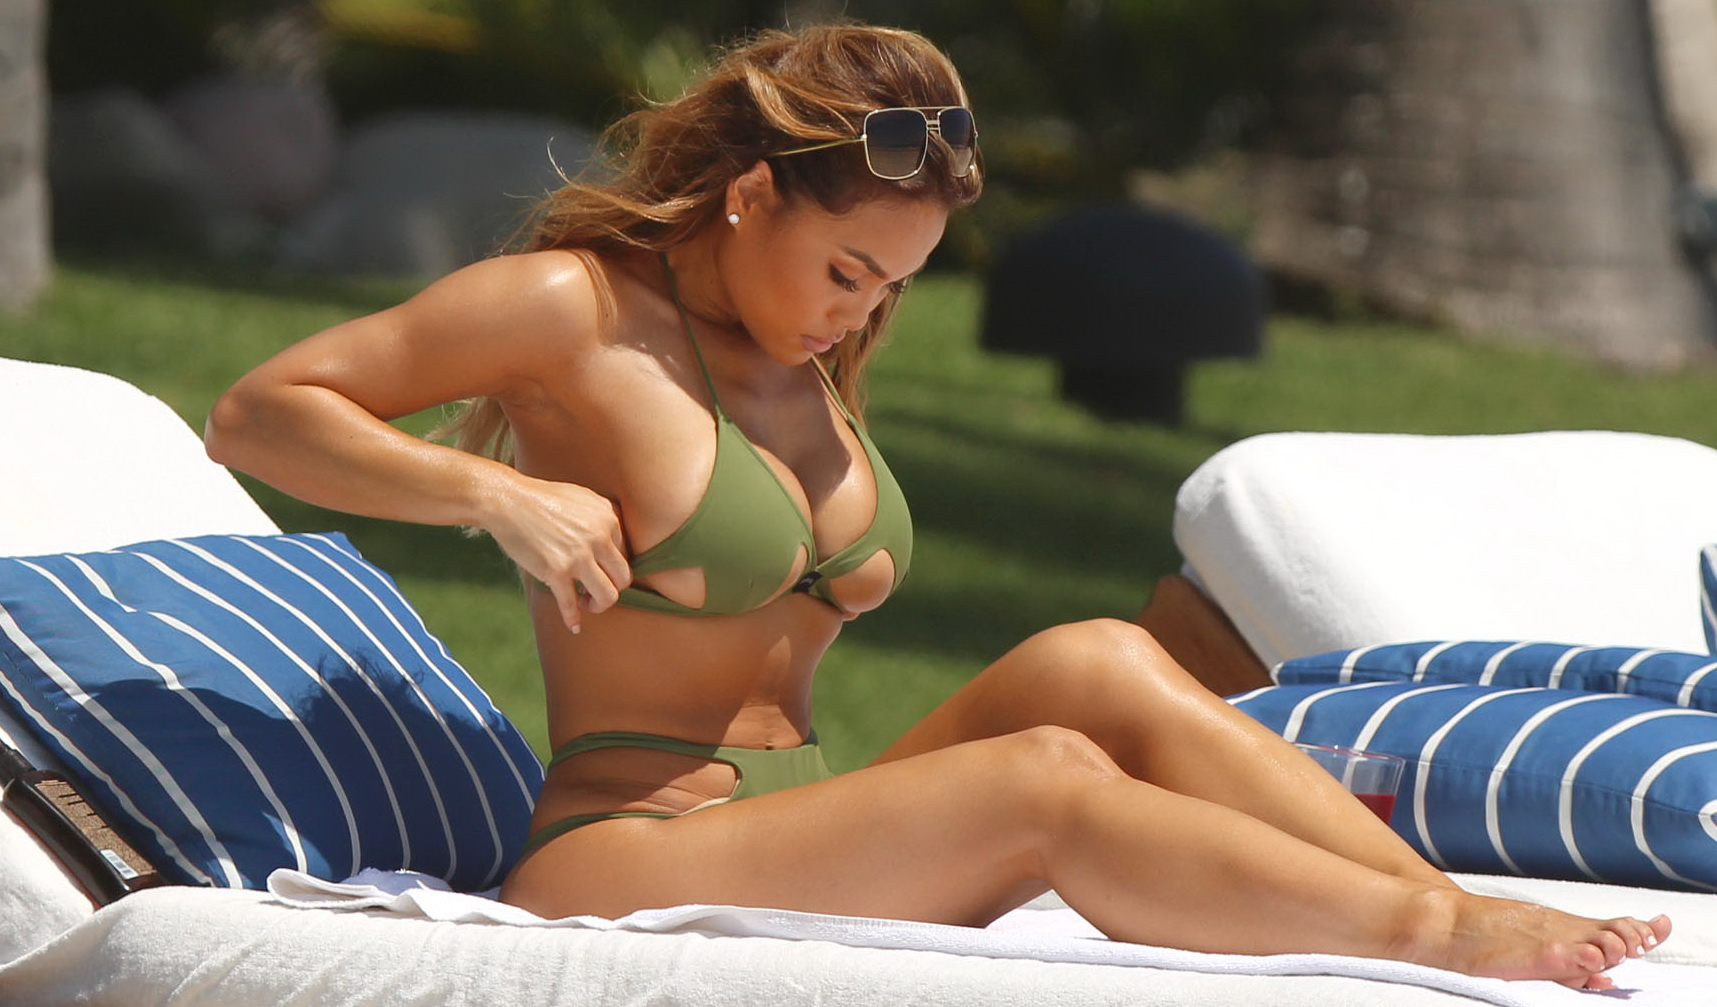 daphne-joy-wearing-a-green-bikini-in-punta-mita-24